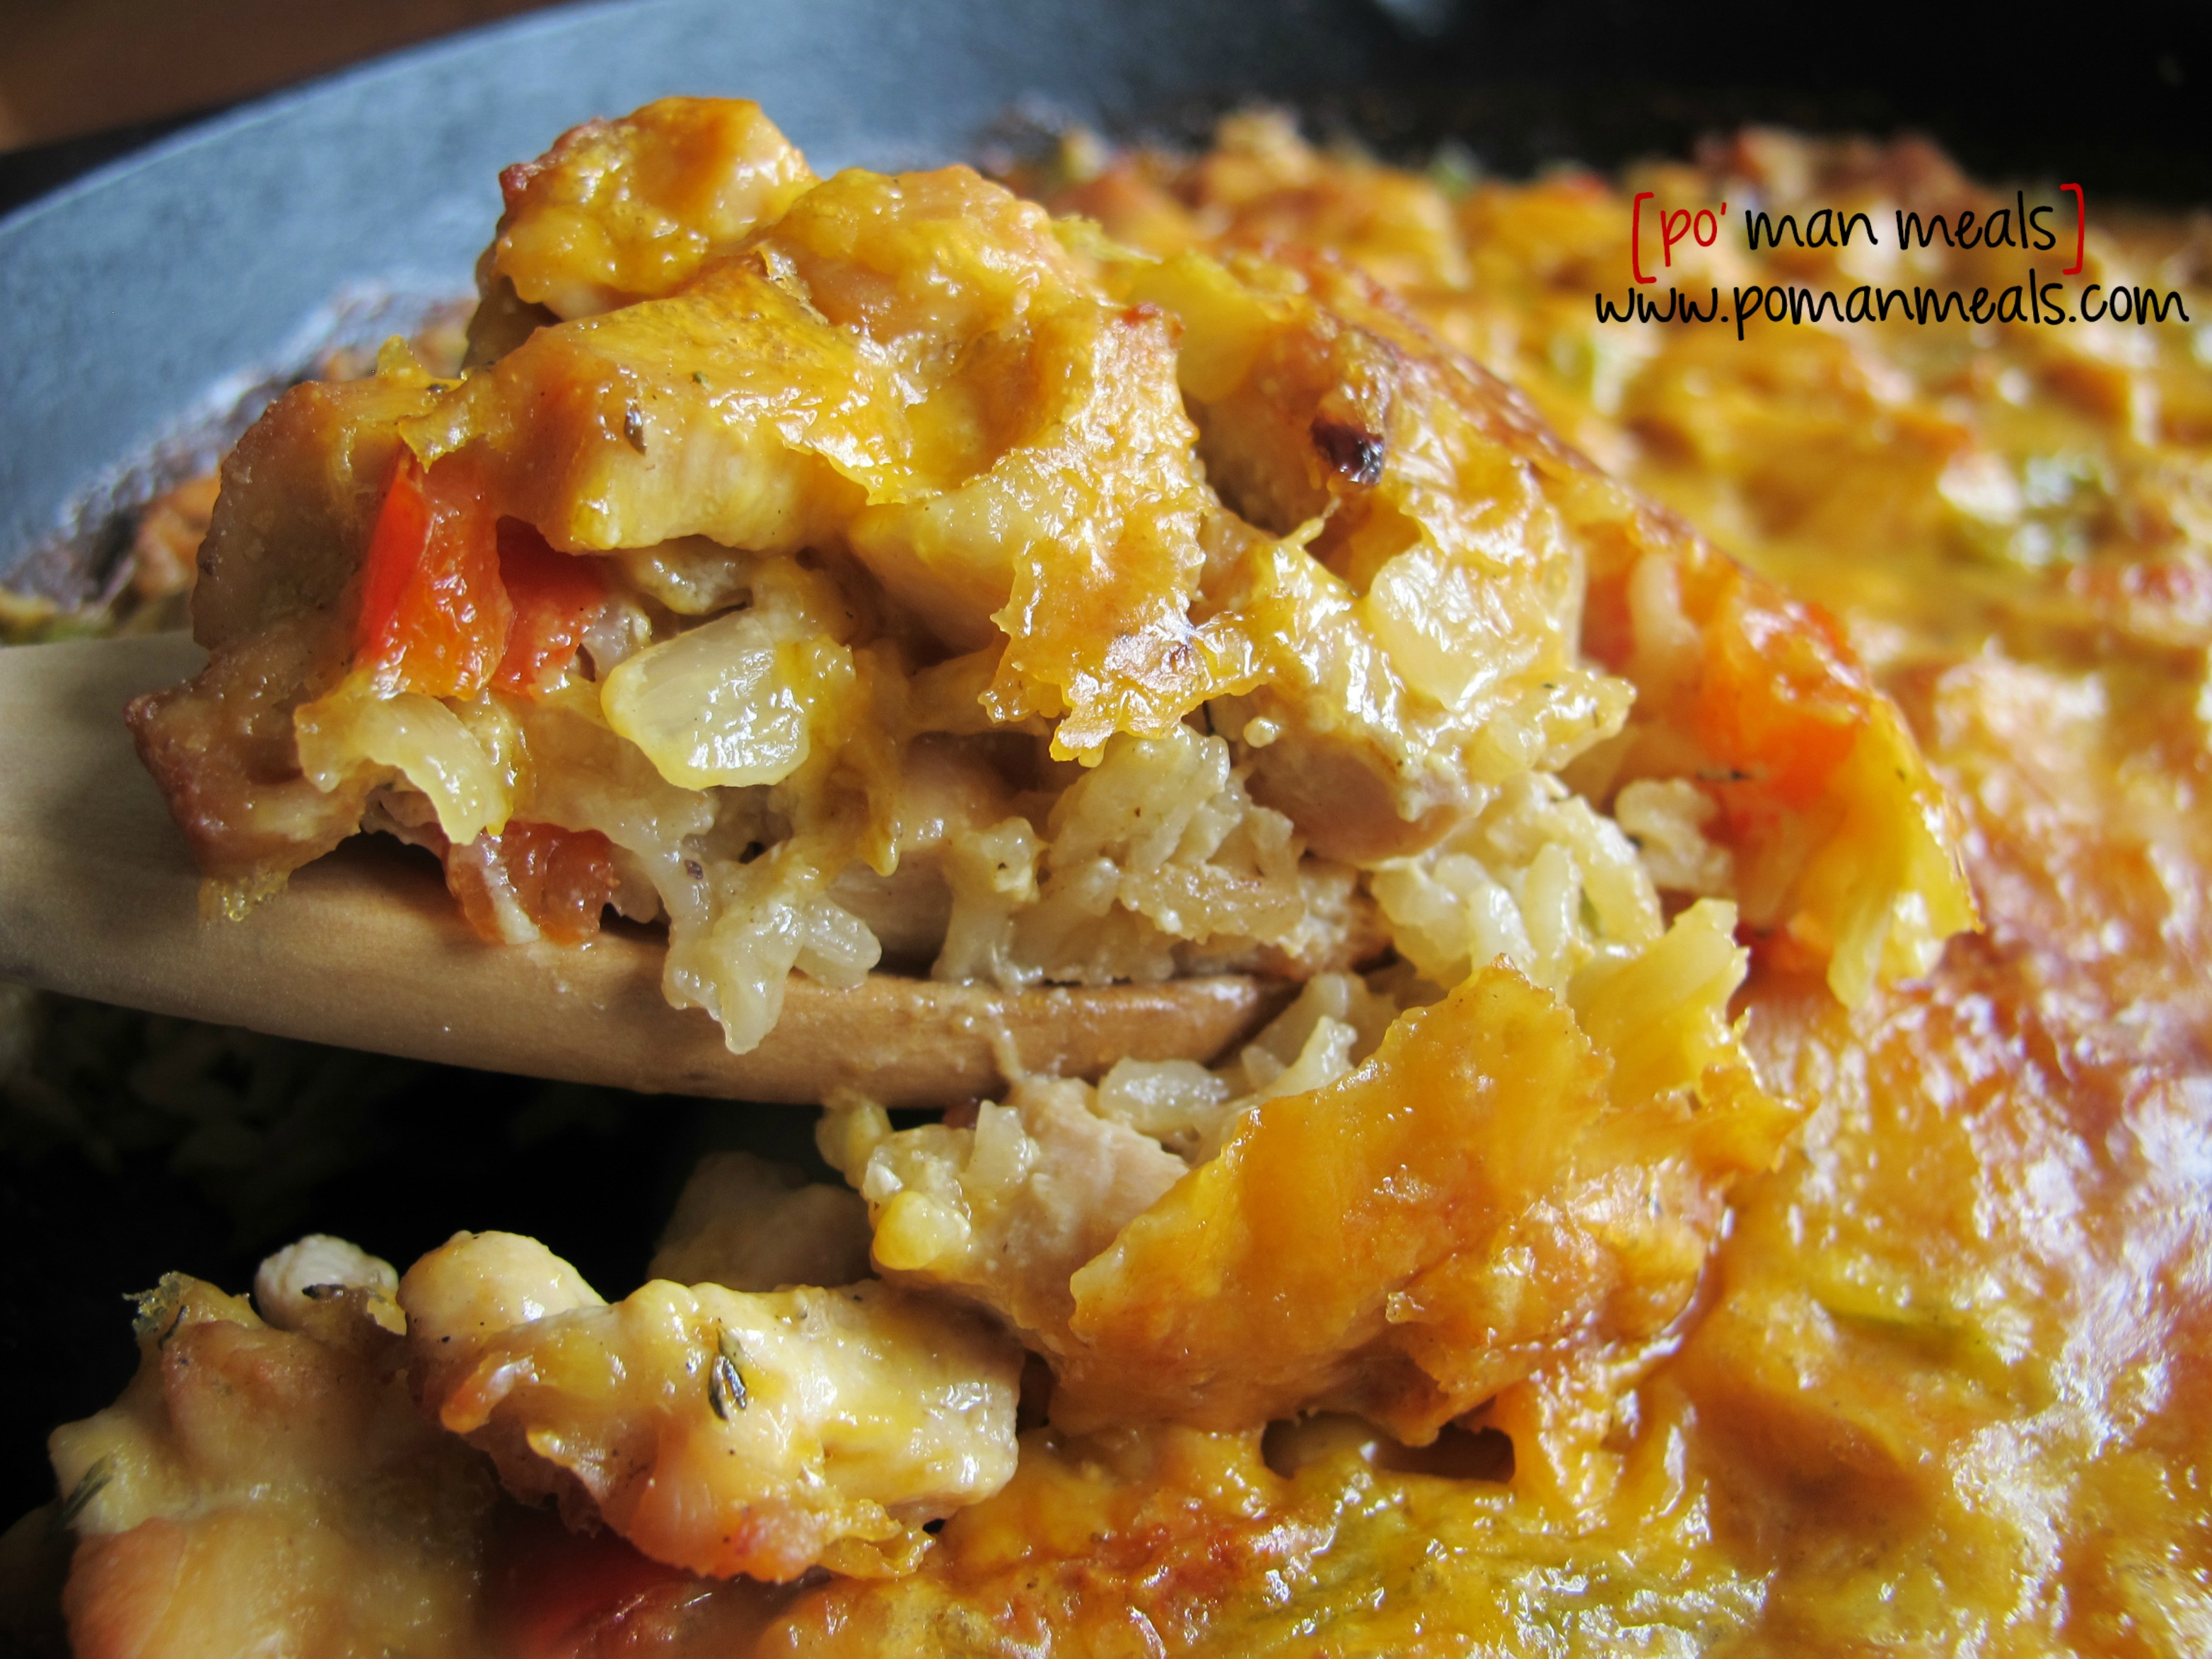 spoon-chicken-and-rice-wm.jpg